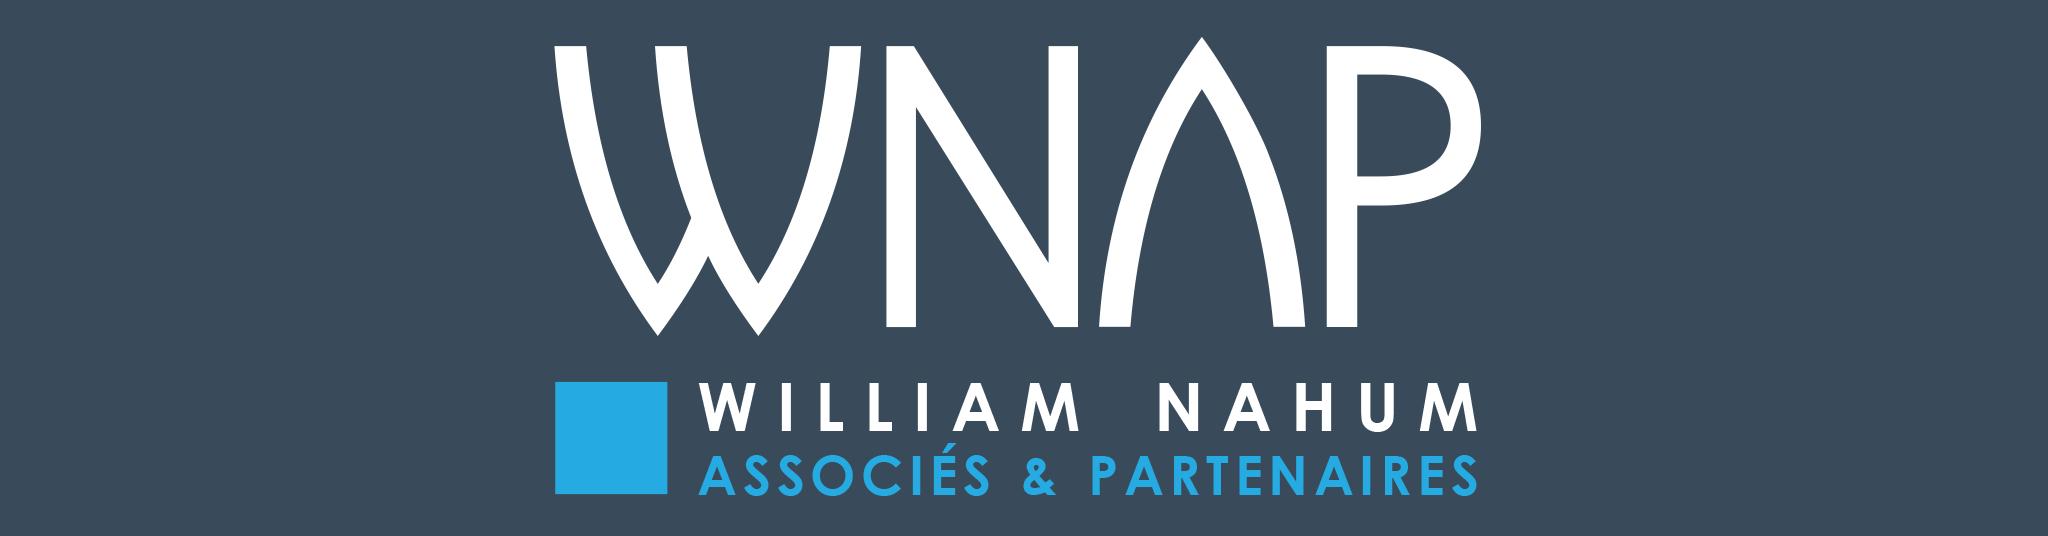 Logo SAS William Nahum Associes Partenaires